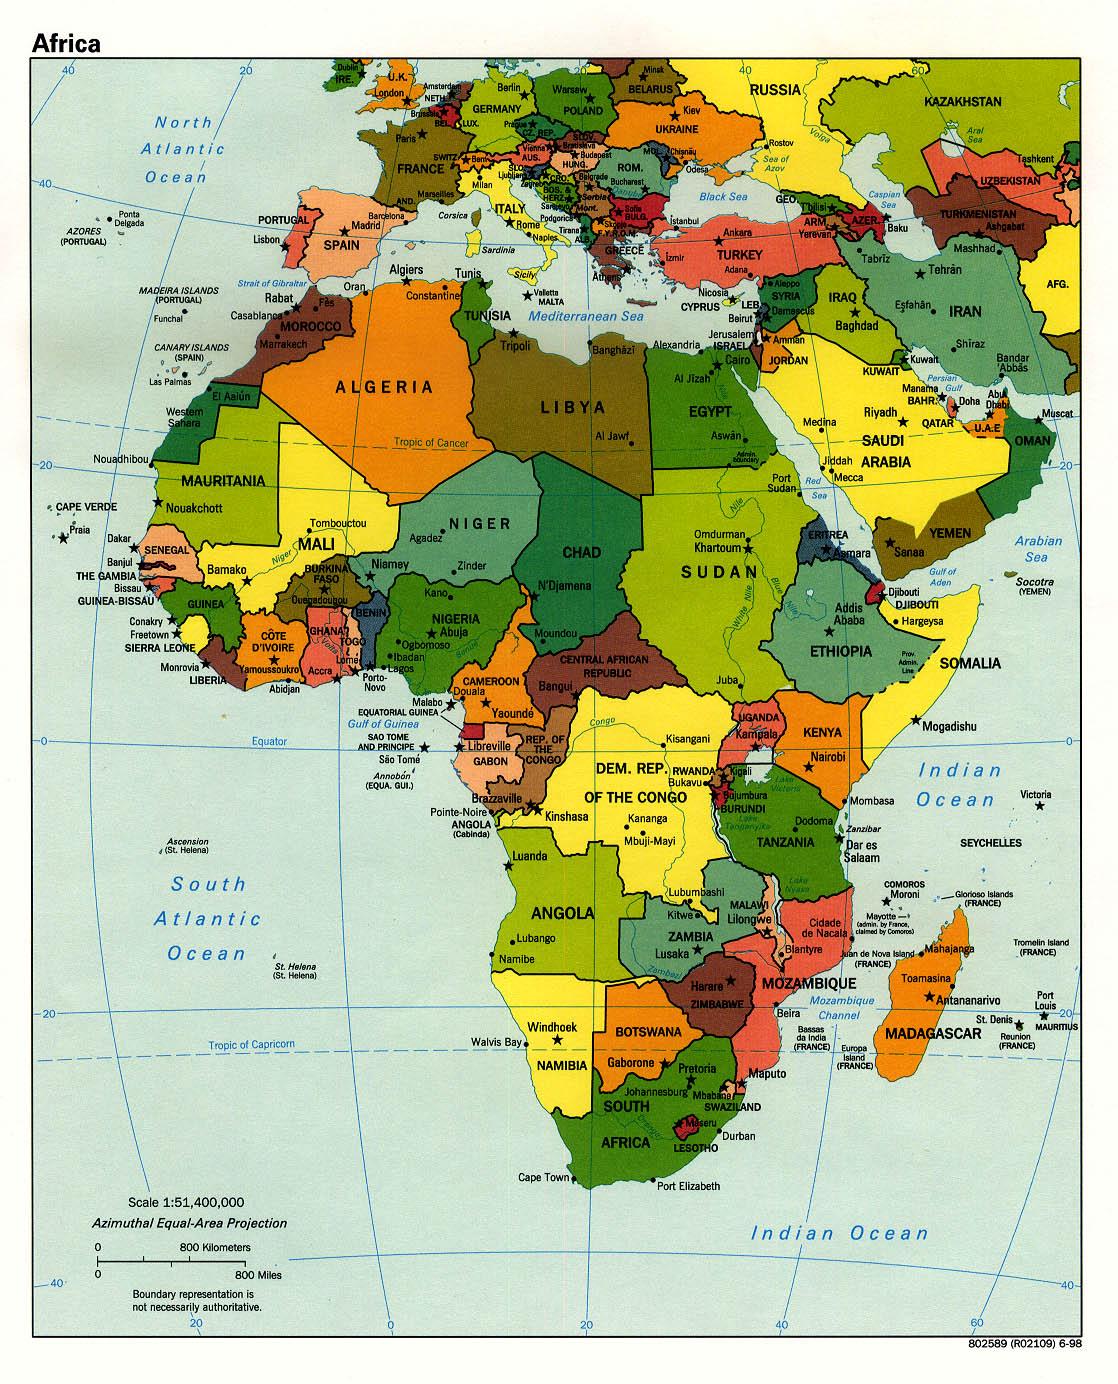 http://johan.lemarchand.free.fr/cartes/afrique/africa02.jpg